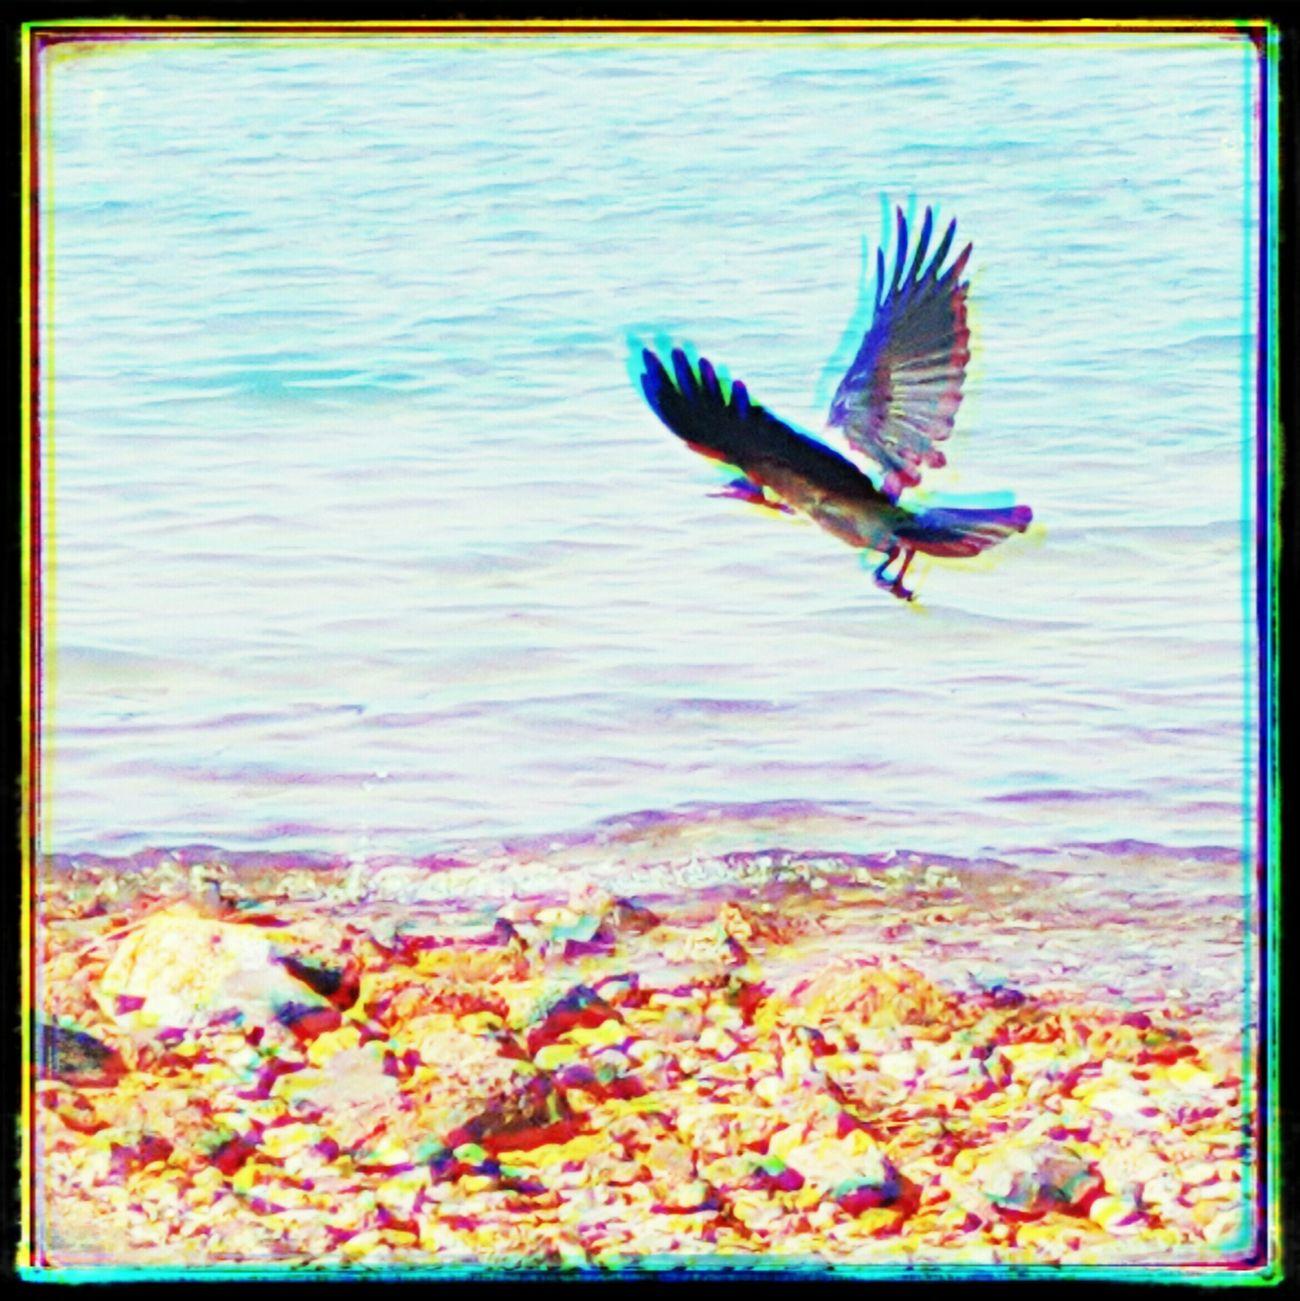 The crow 😉 Bird Birds🐦⛅ Flying Bird Flying Overseas Sea Beach Turquoise Water